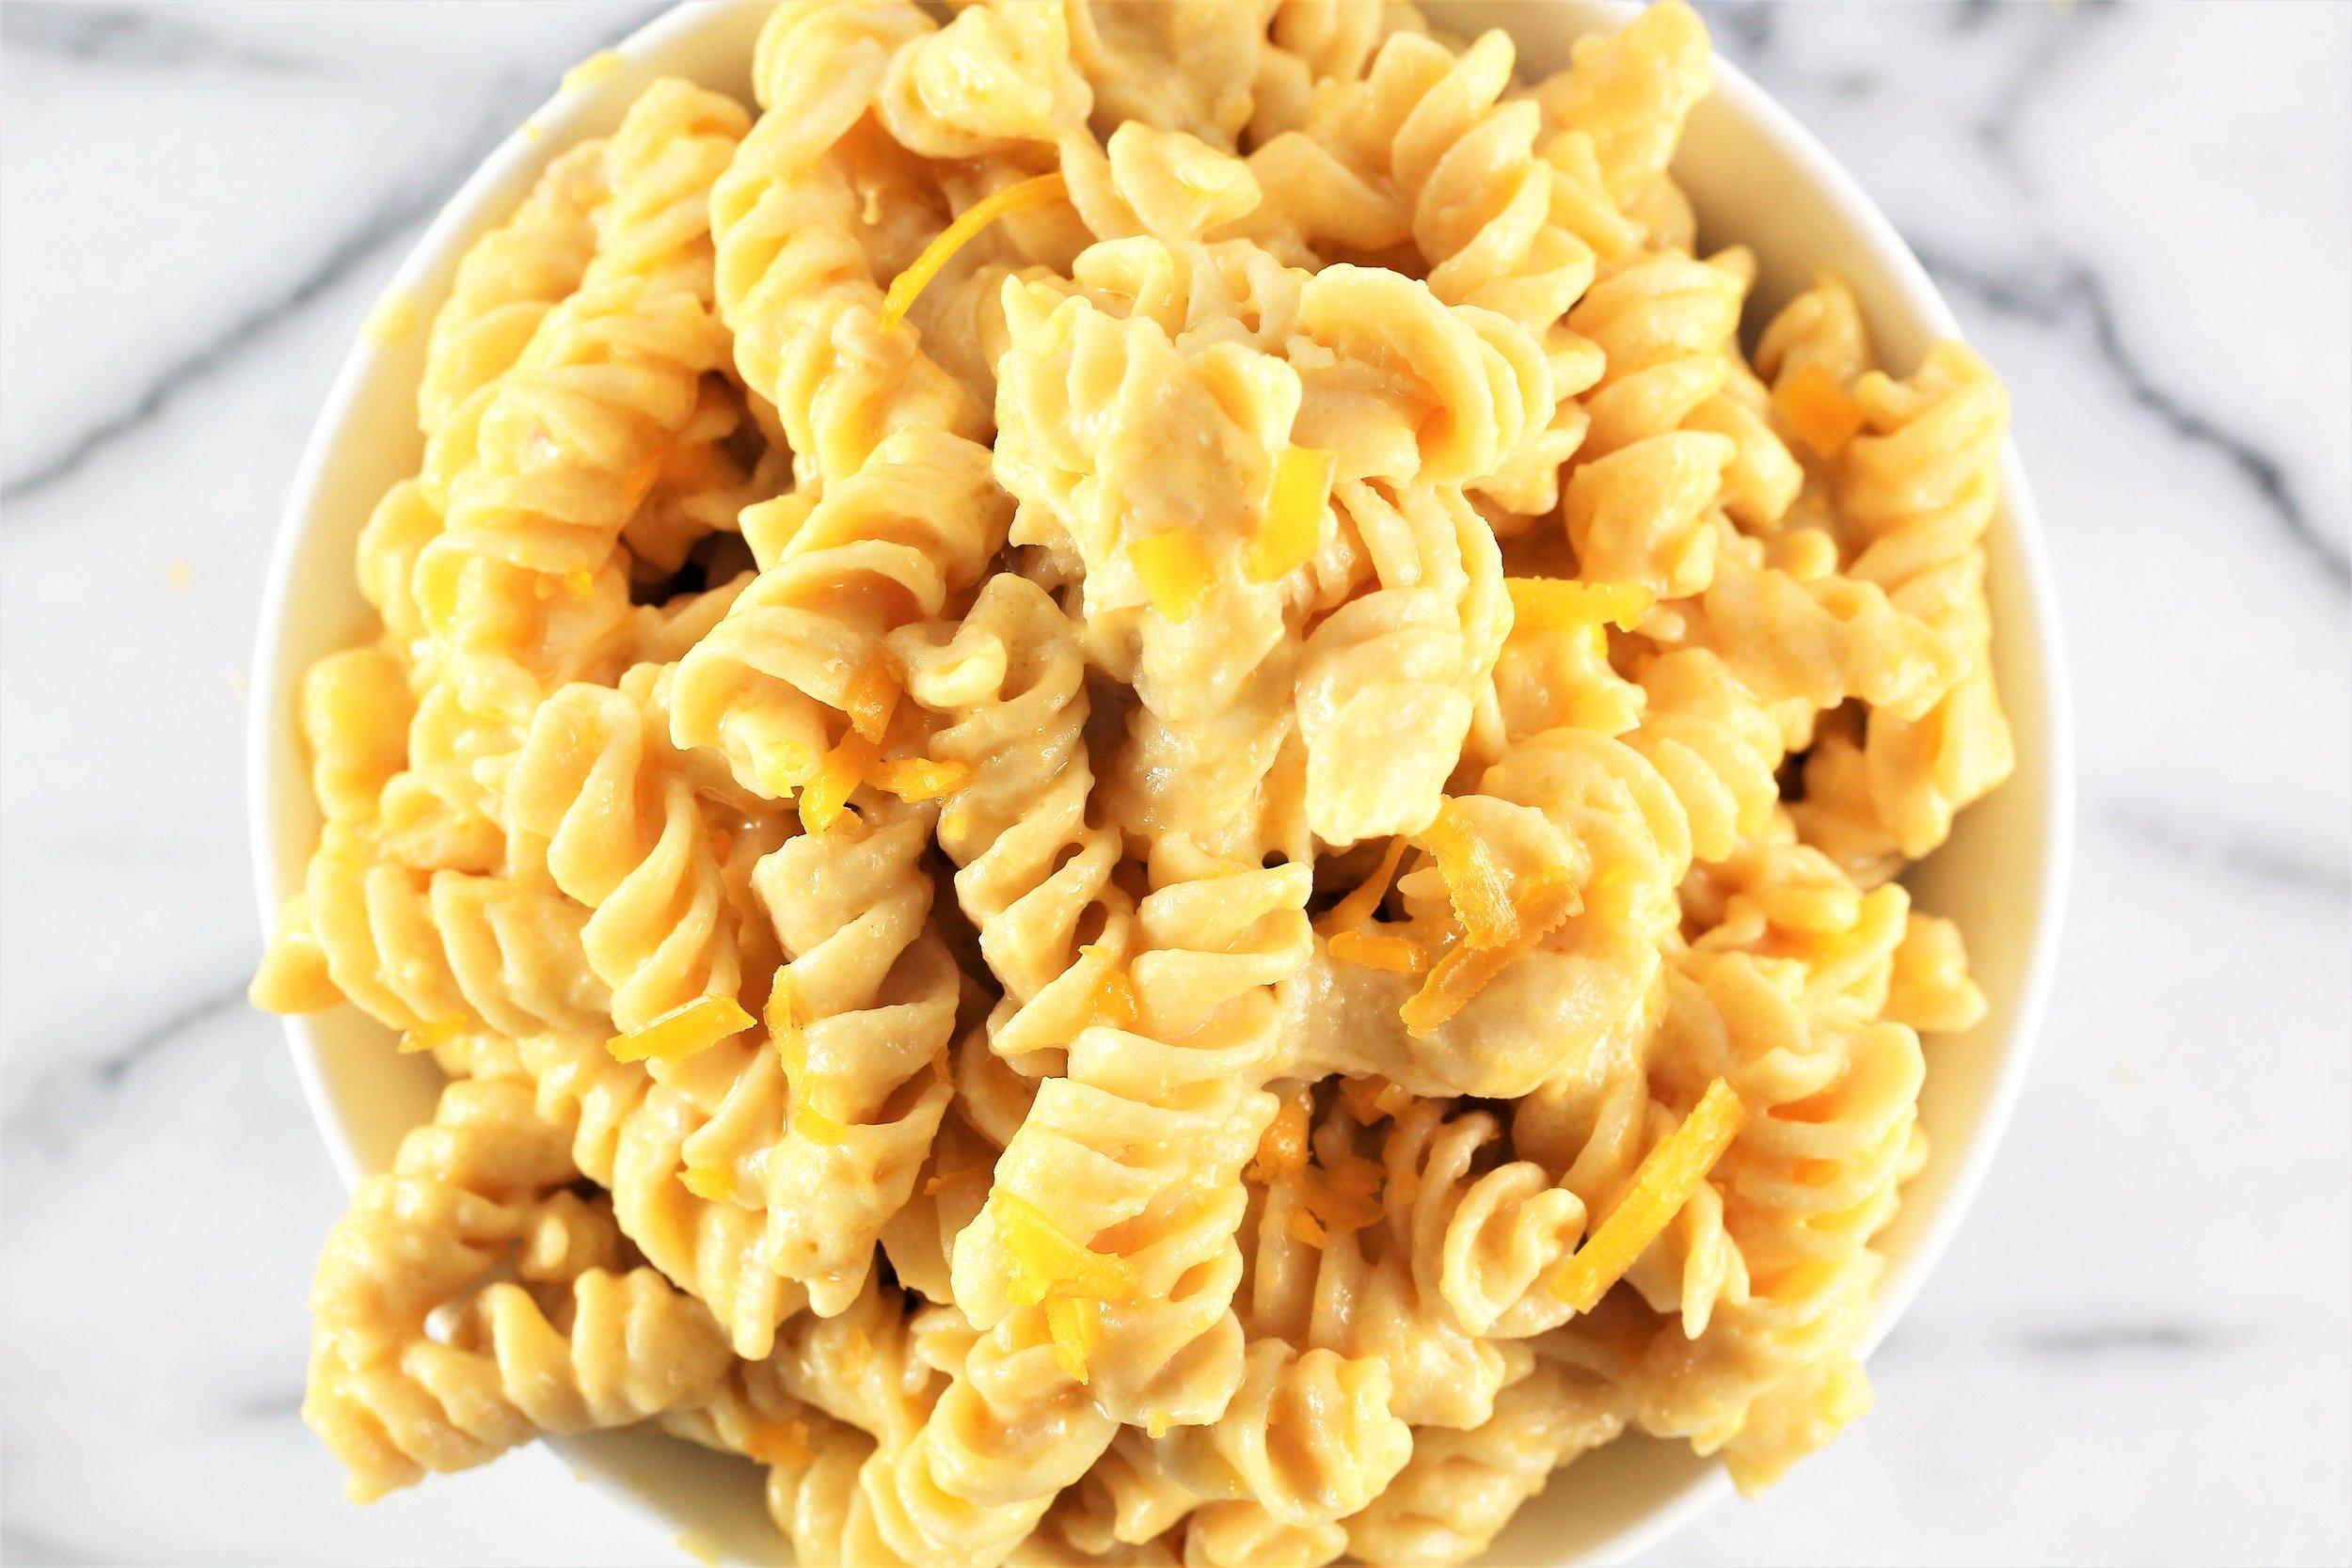 20-minute Homemade Mac and Cheese